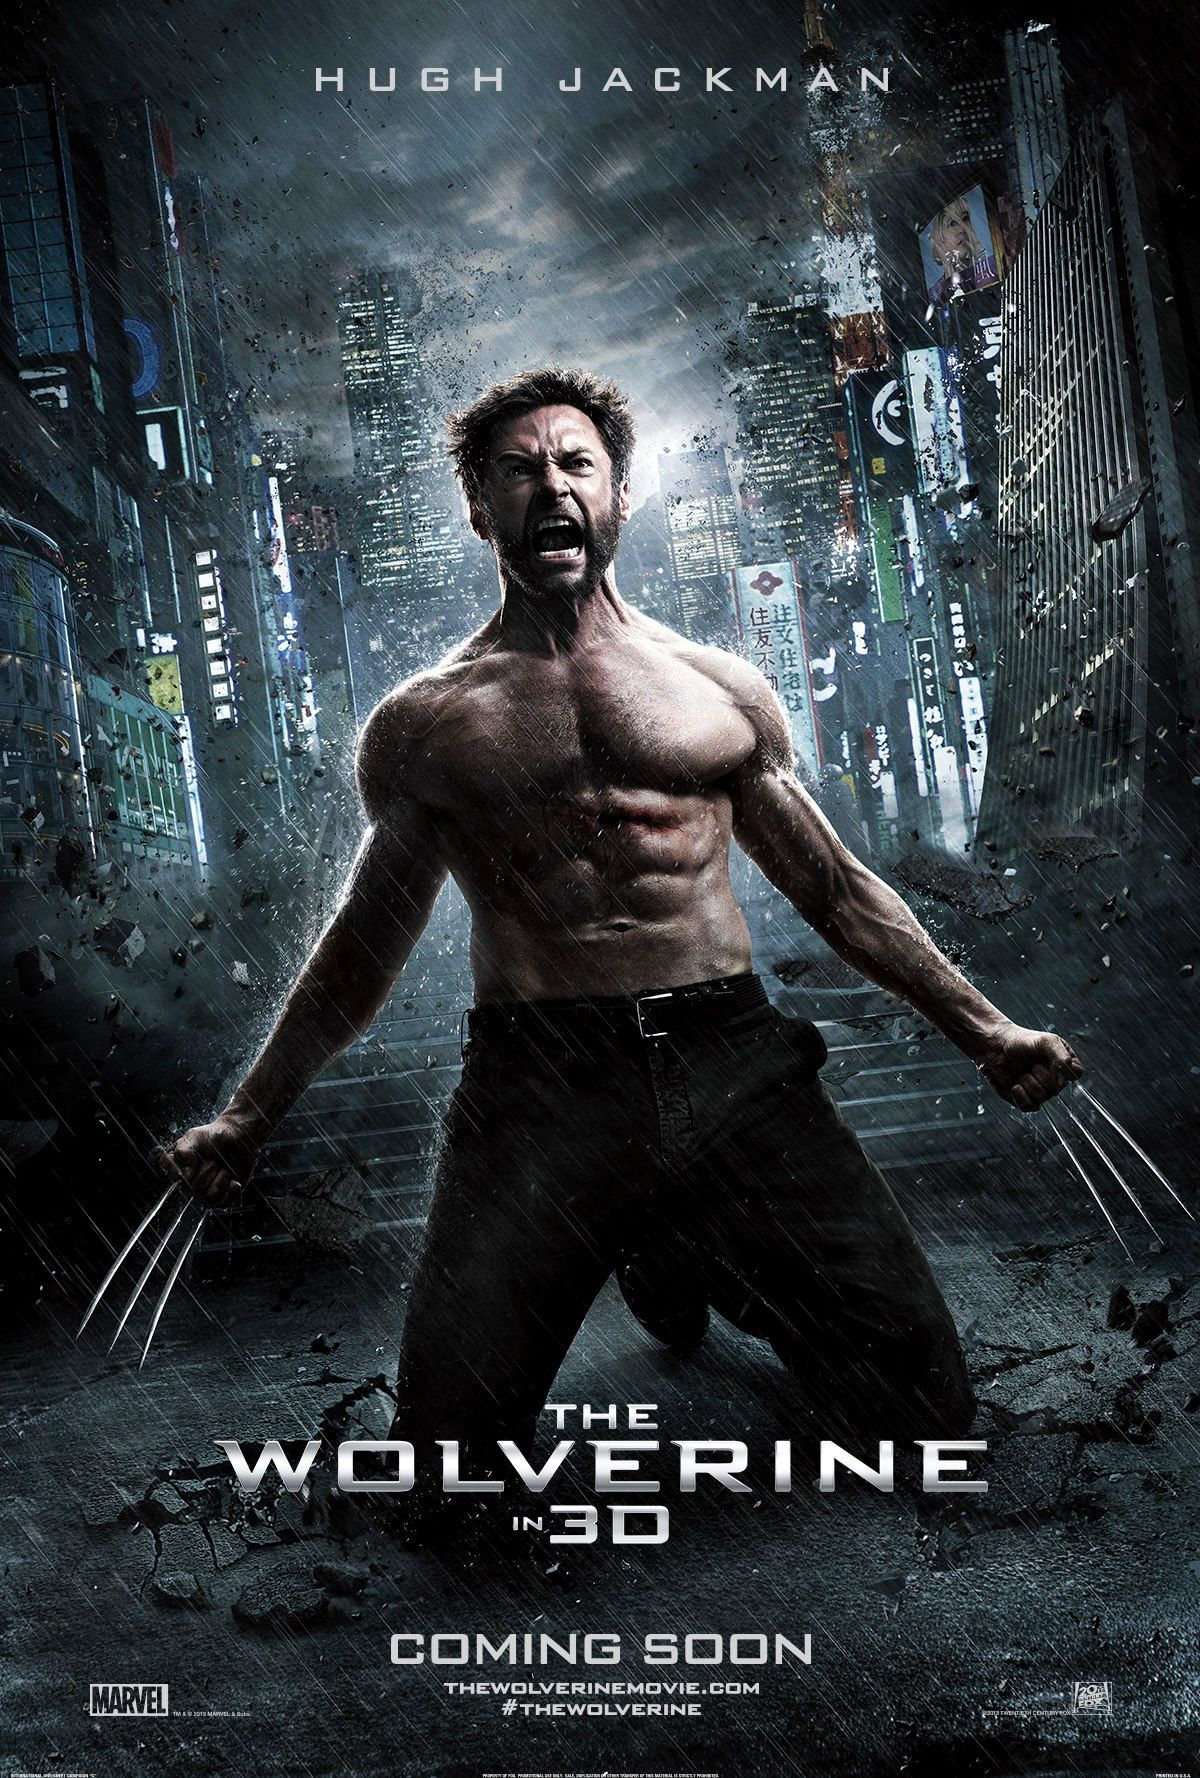 Wolverine Director Teases Movie In Fierce 6 Second Vine Wolverine Movie Man Movies Movie Teaser